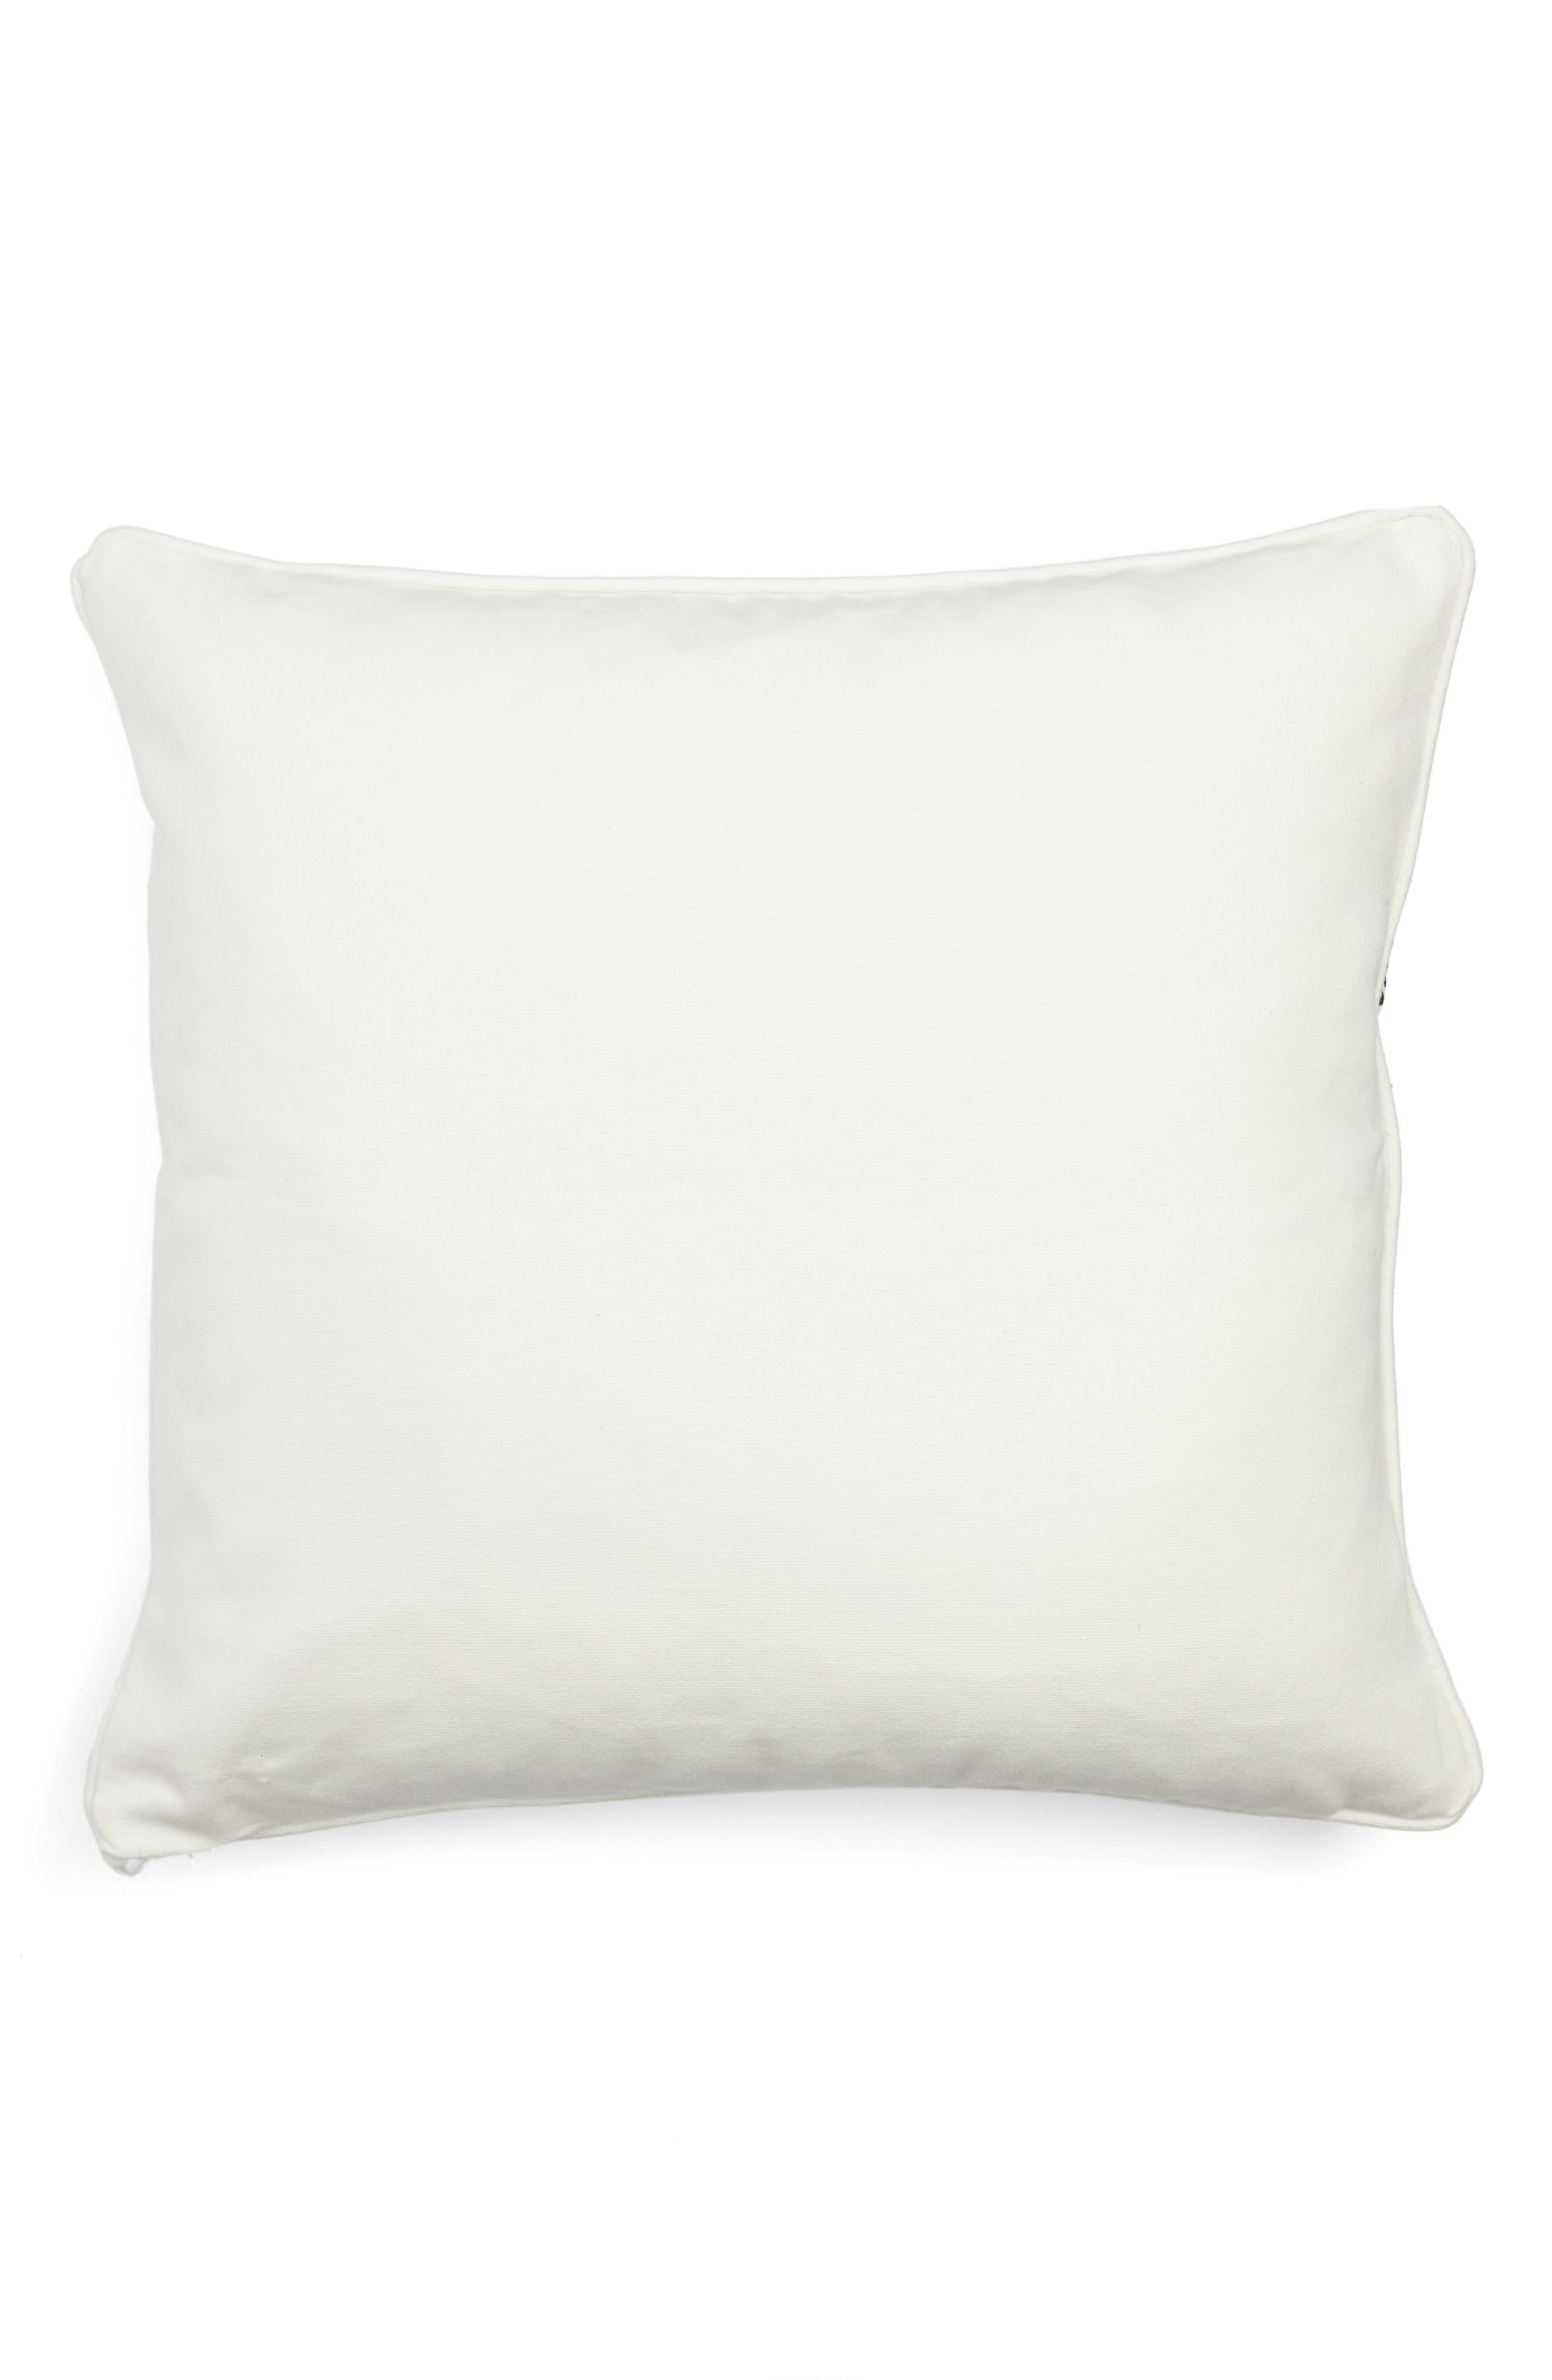 Embroidered Medallion Pillow,                             Alternate thumbnail 2, color,                             White